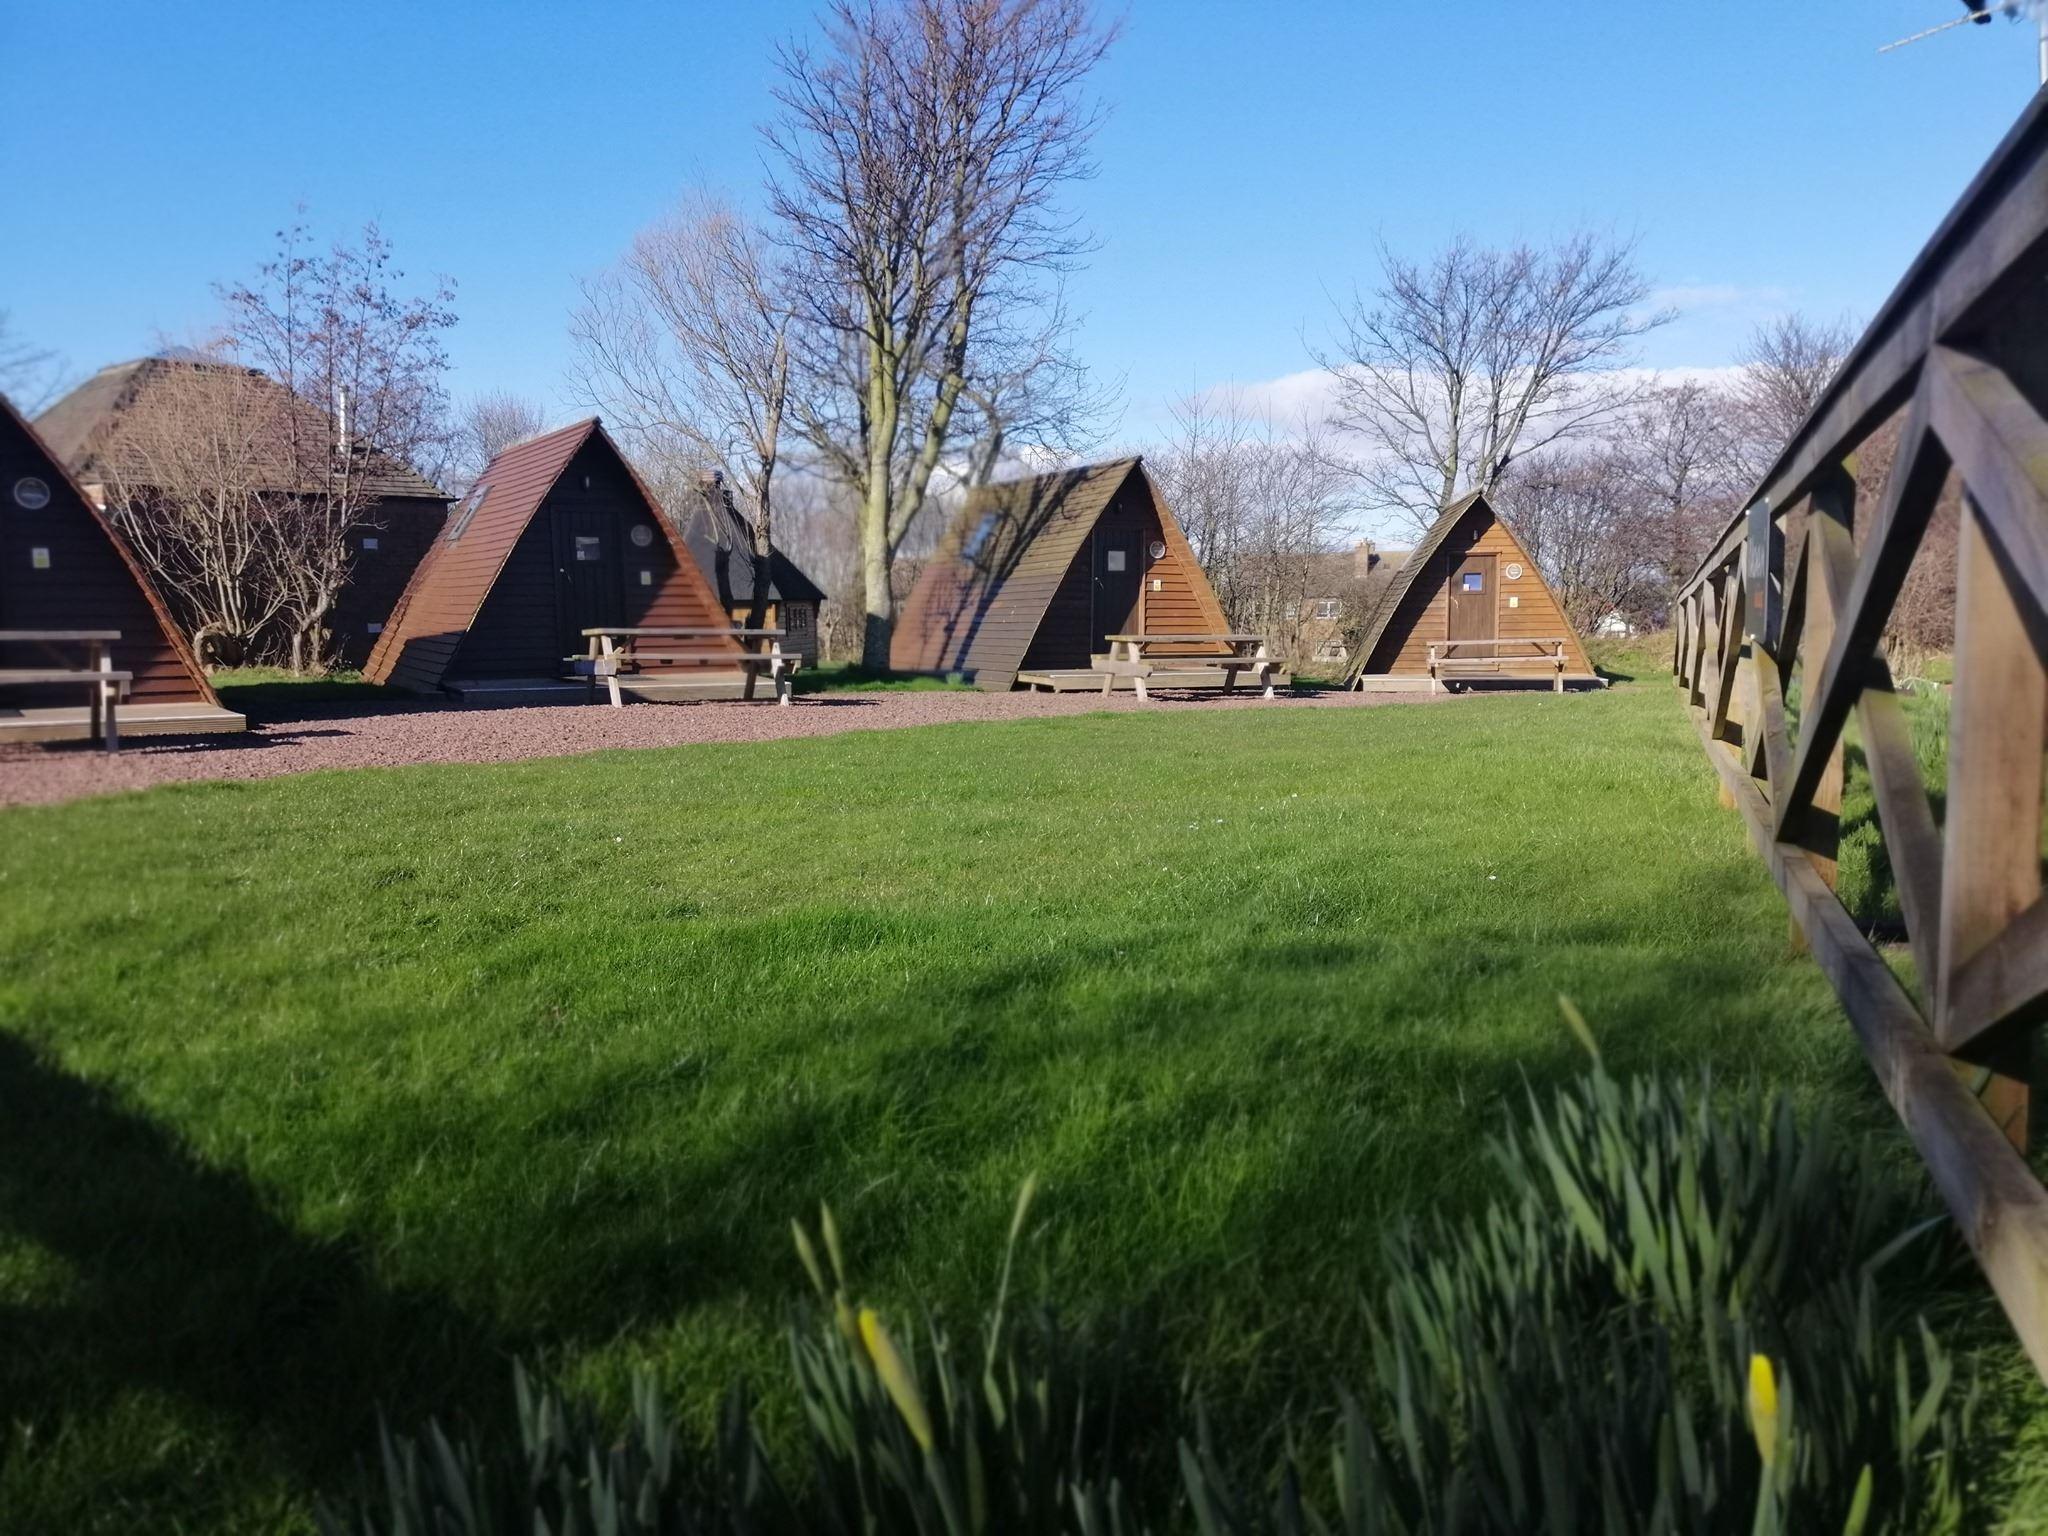 Tantallon Camping & Caravan Park